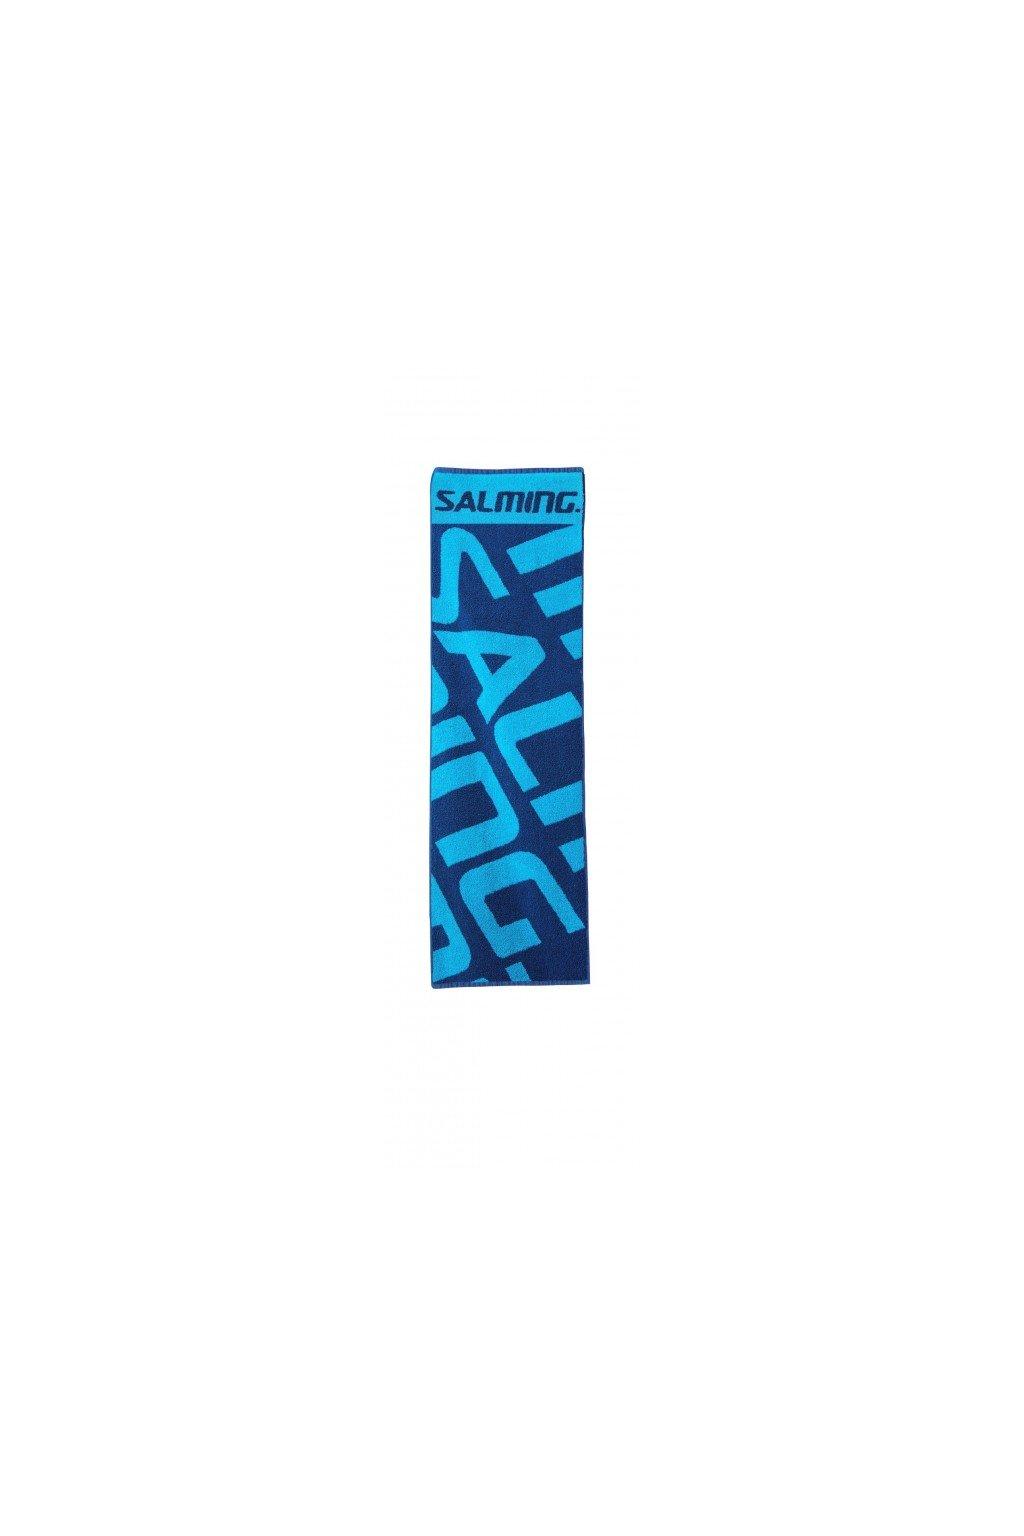 salming gym towel navy blue